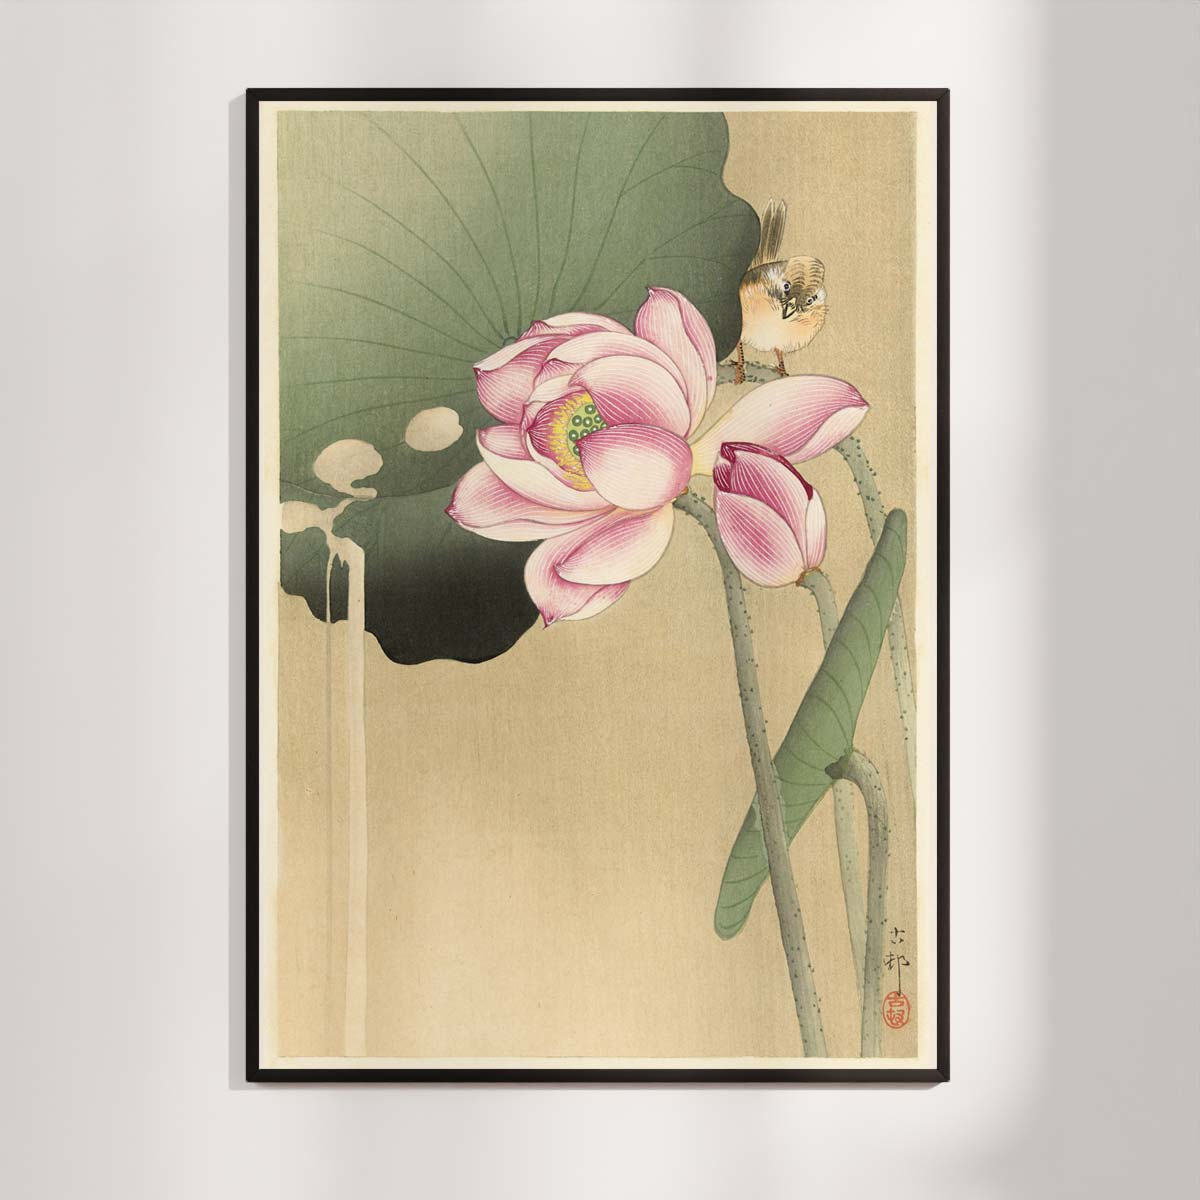 Plakat - Japansk Træsnit - Sangfugl og lotus - Ohara Koson